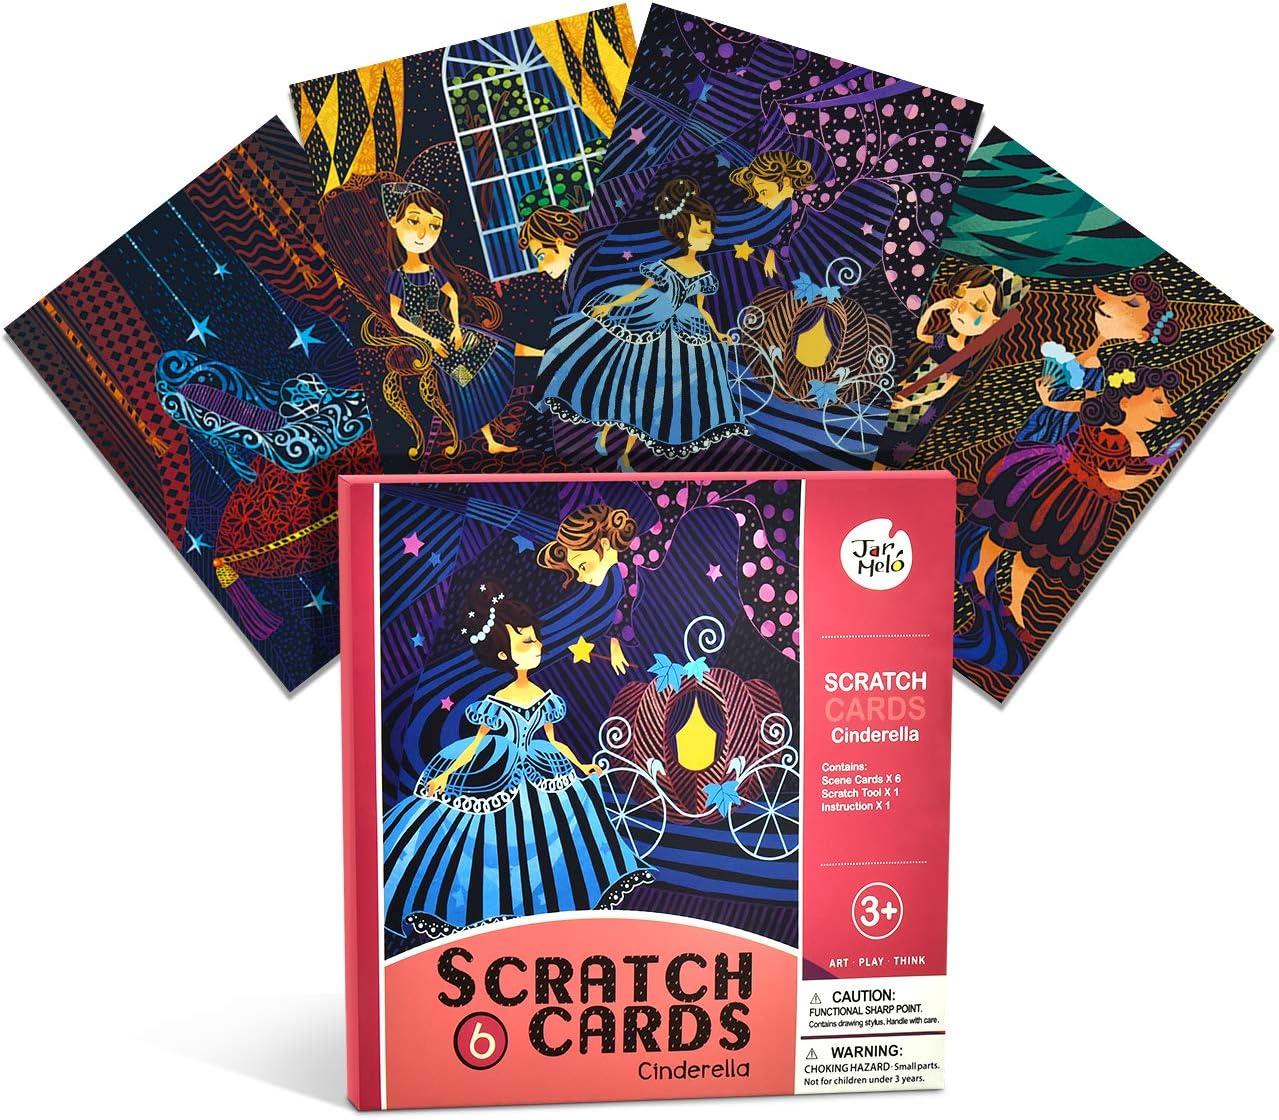 SMLRO Scratch Art Notebooks 6PCS Rainbow Mini Notes /& 6 Wooden Styluses Rainbow Scratch Art Papers for Kids Arts /& Crafts